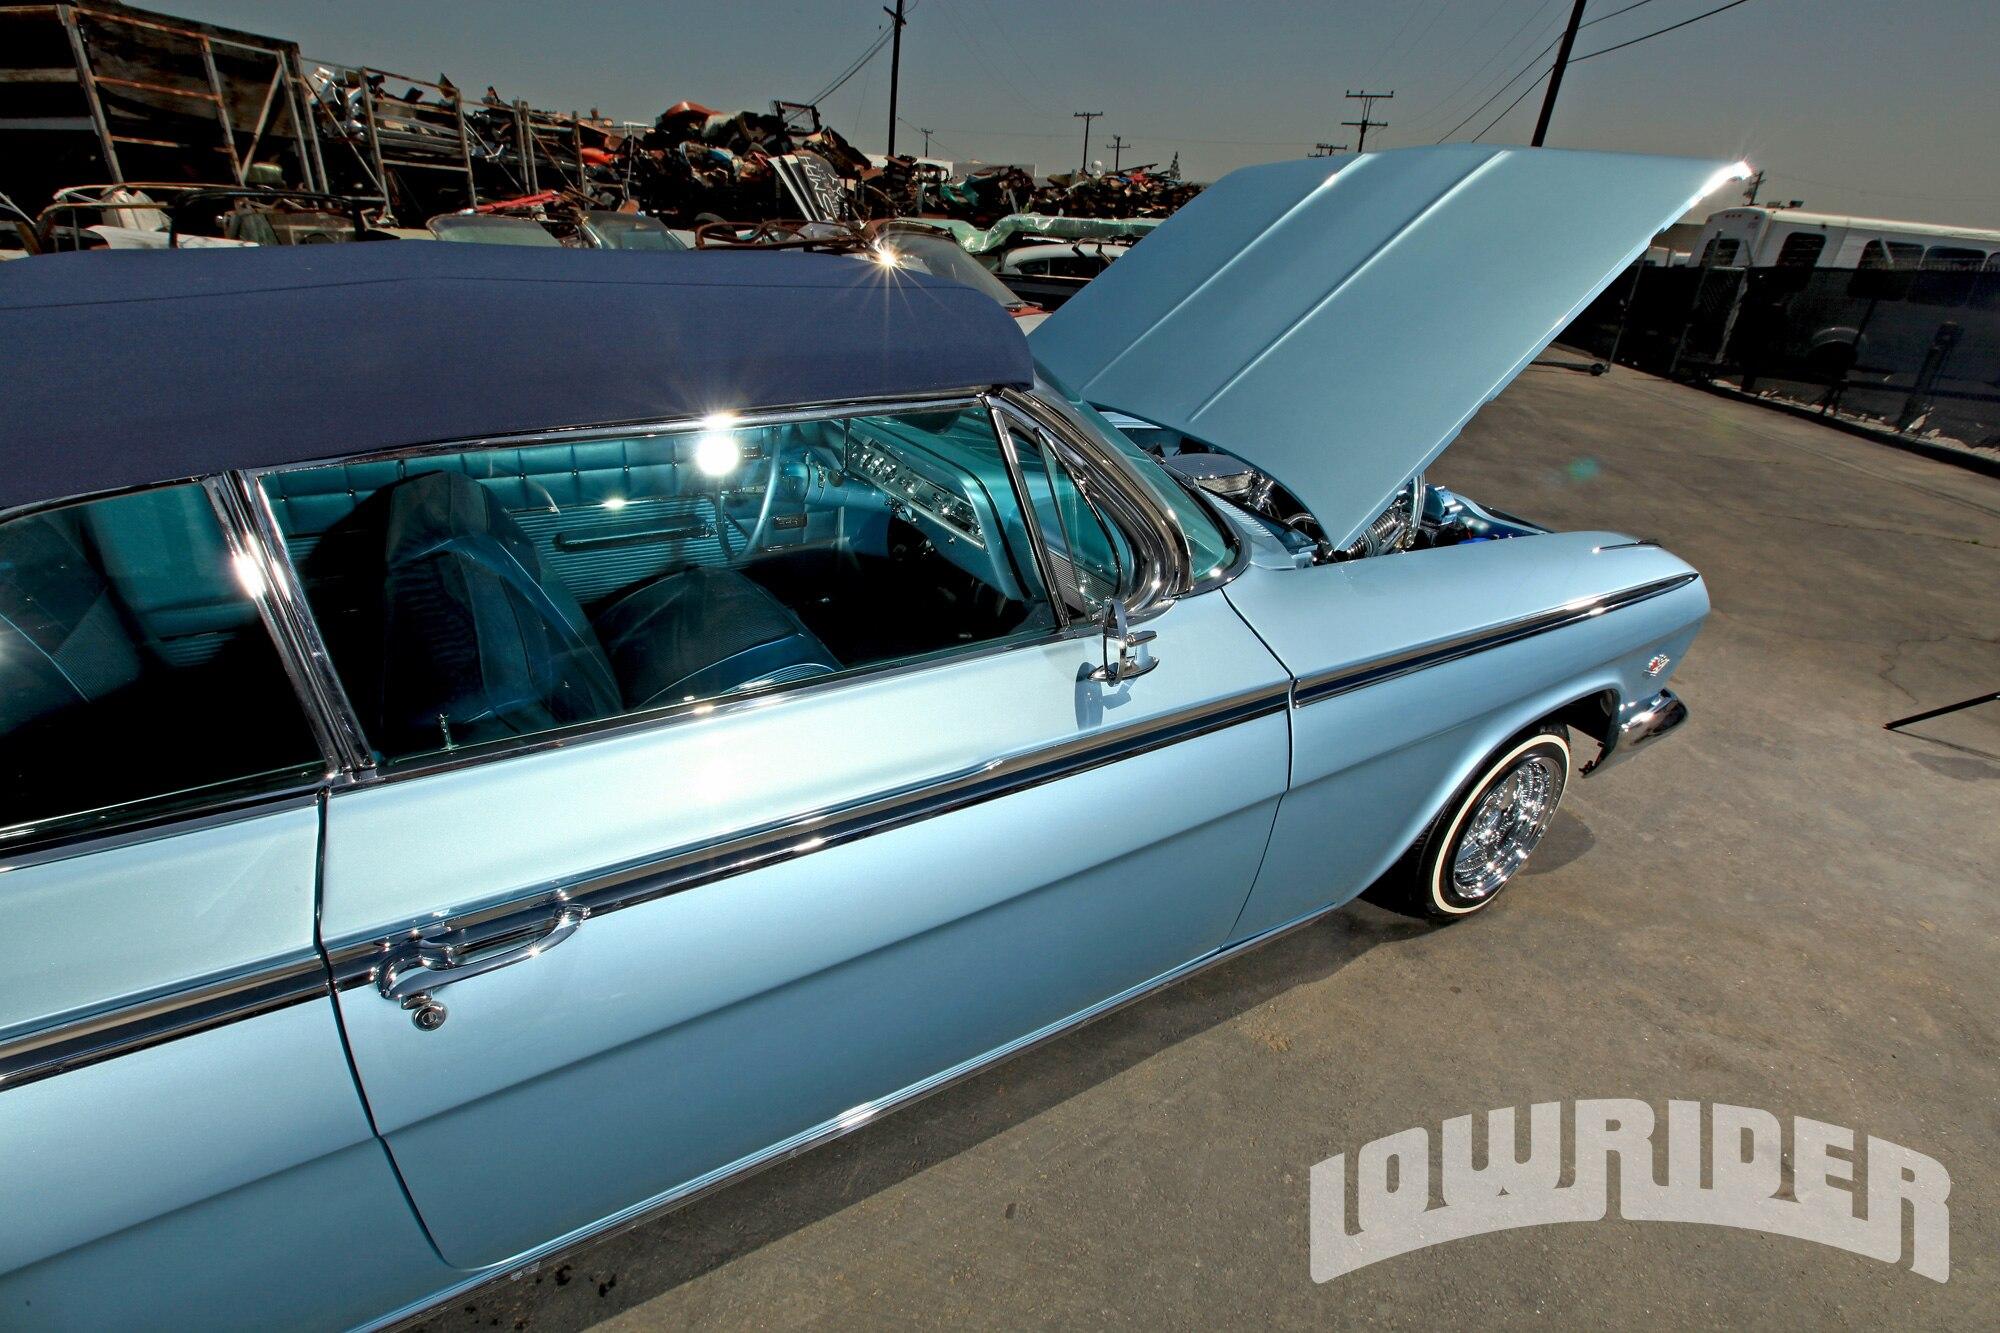 lrmp-1201-01-o-1962-impala-convertible-open-hood2